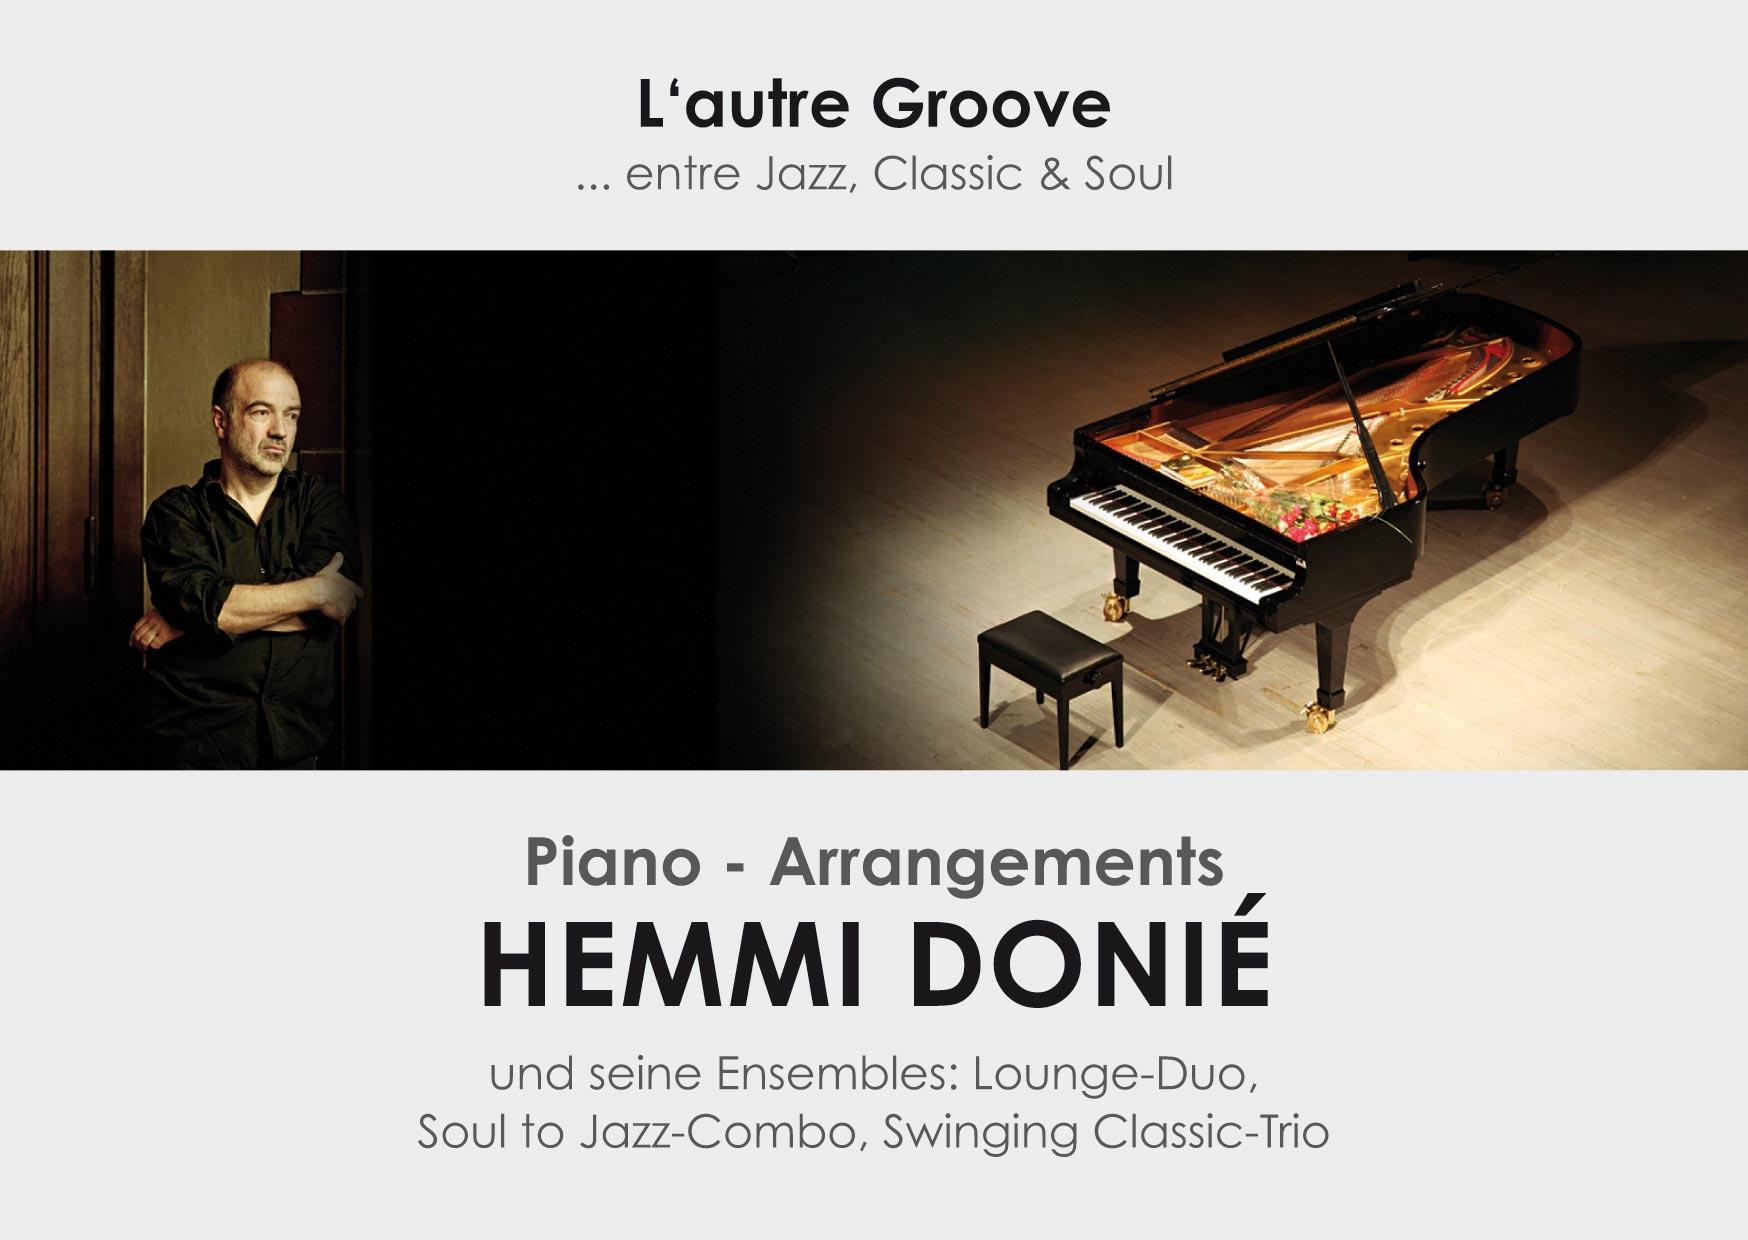 Hemmi-Donie